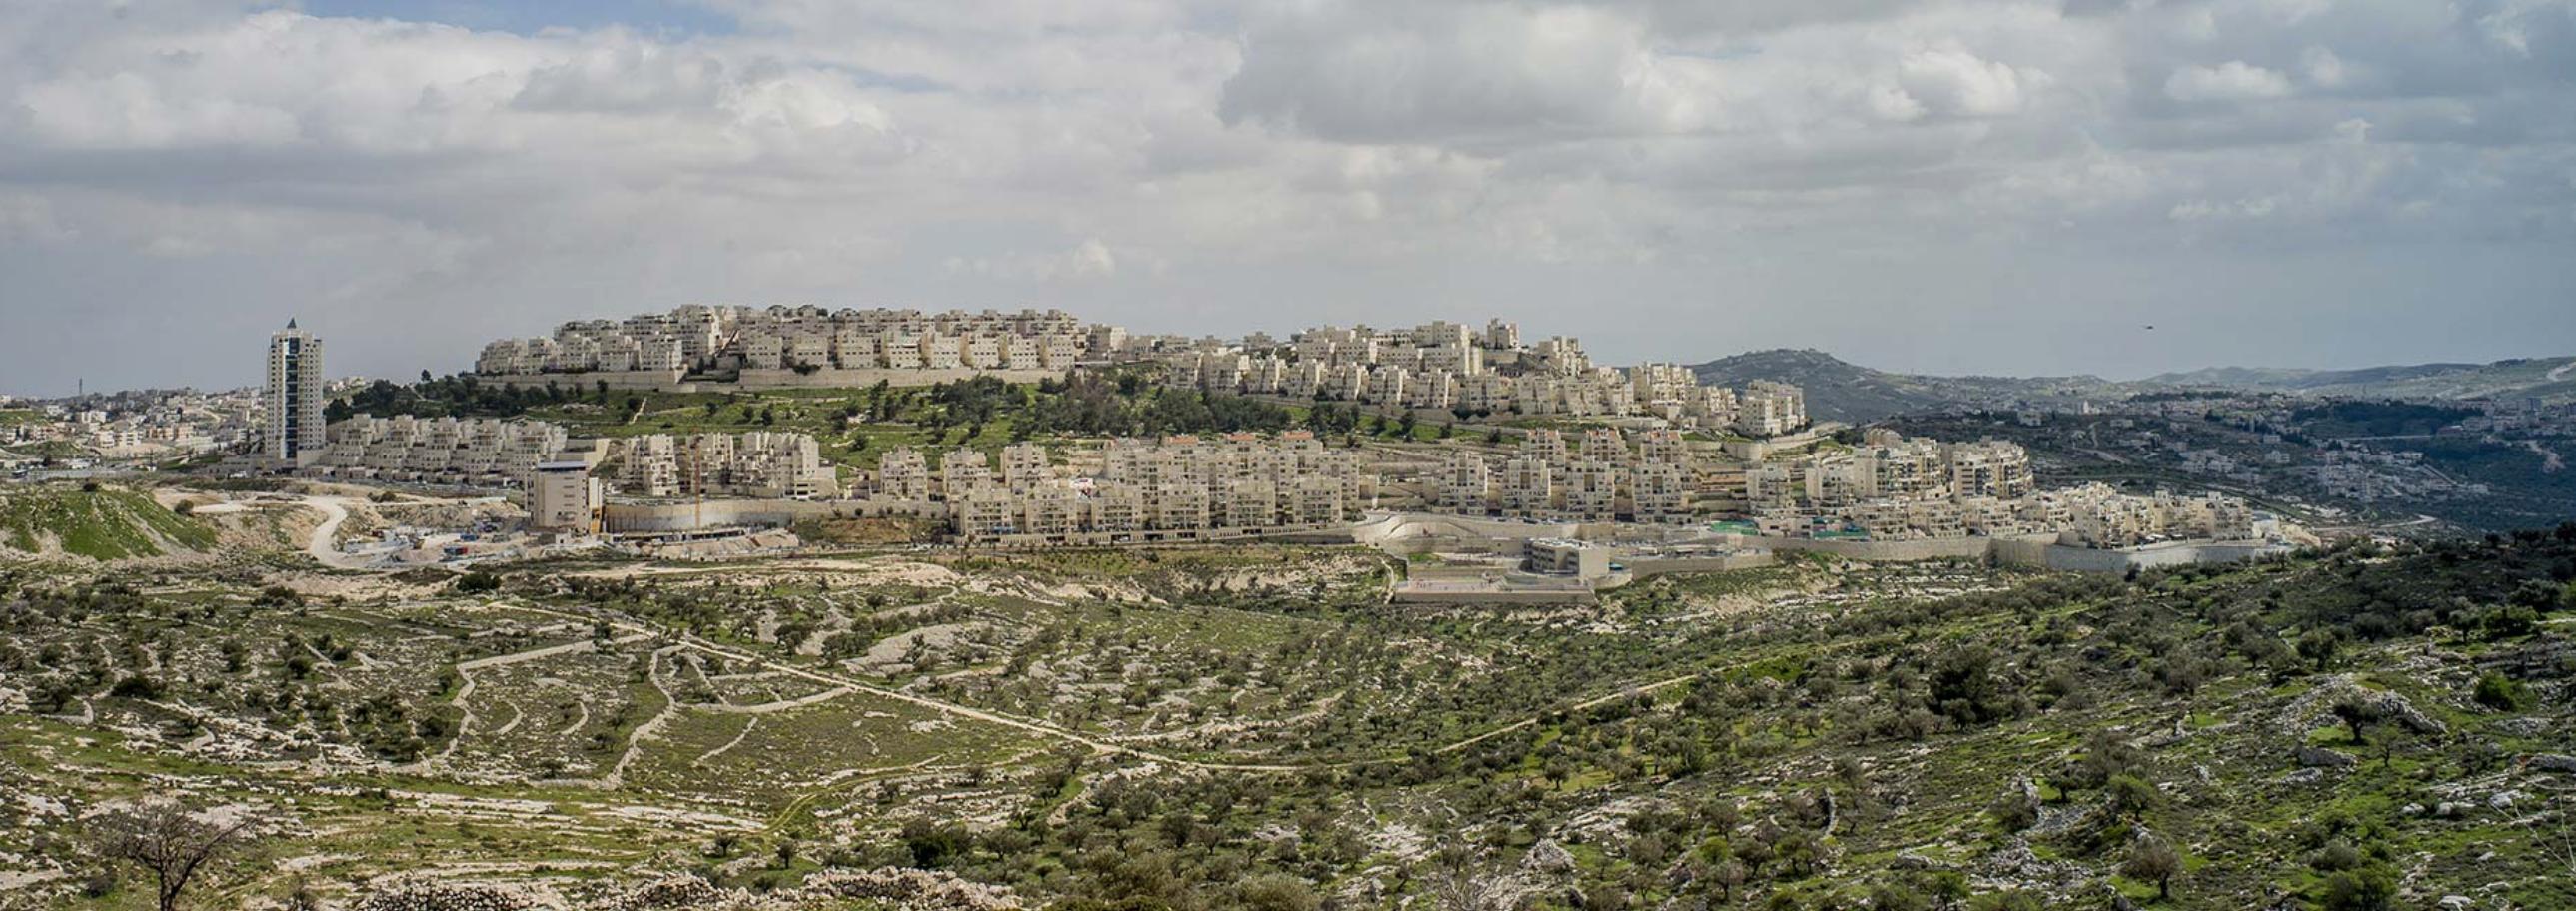 Har Homa--West Bank.png